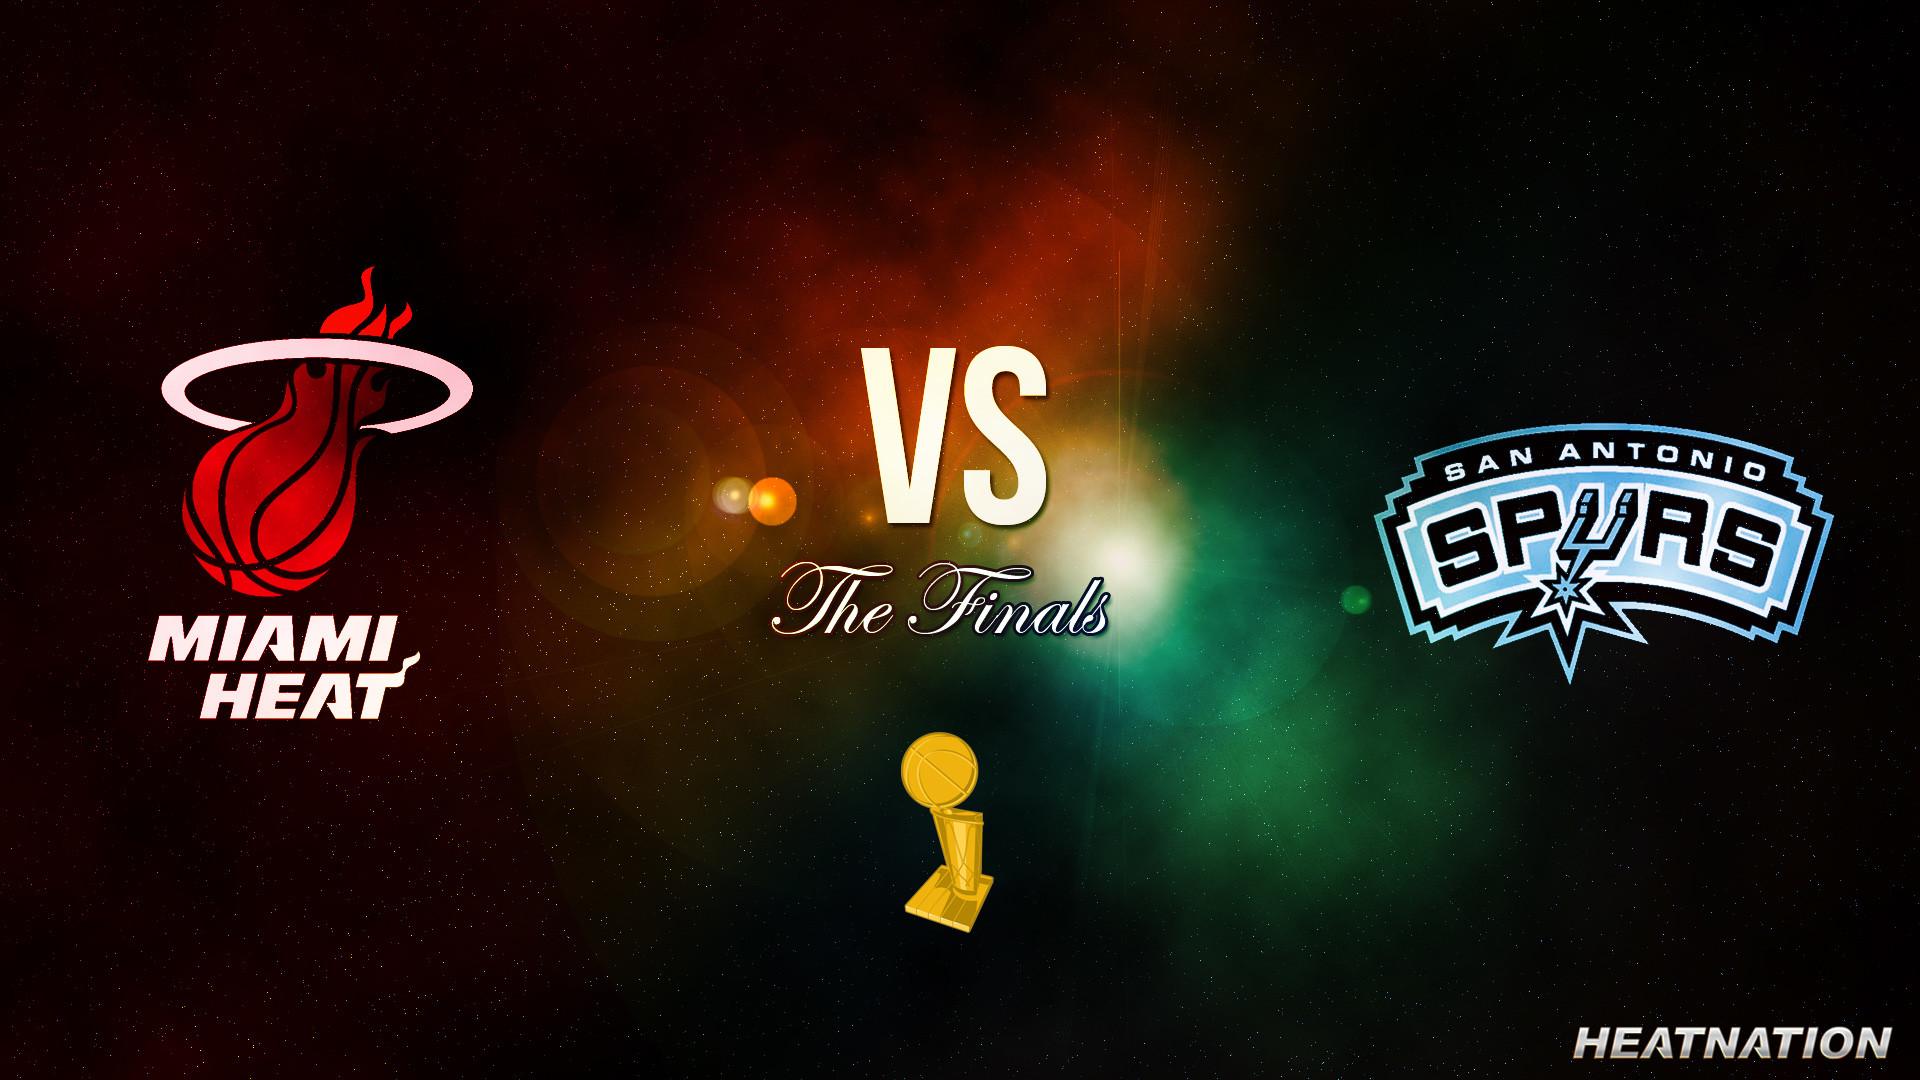 Miami Heat vs San Antonio Spurs NBA Finals Wallpaper – Heat Nation